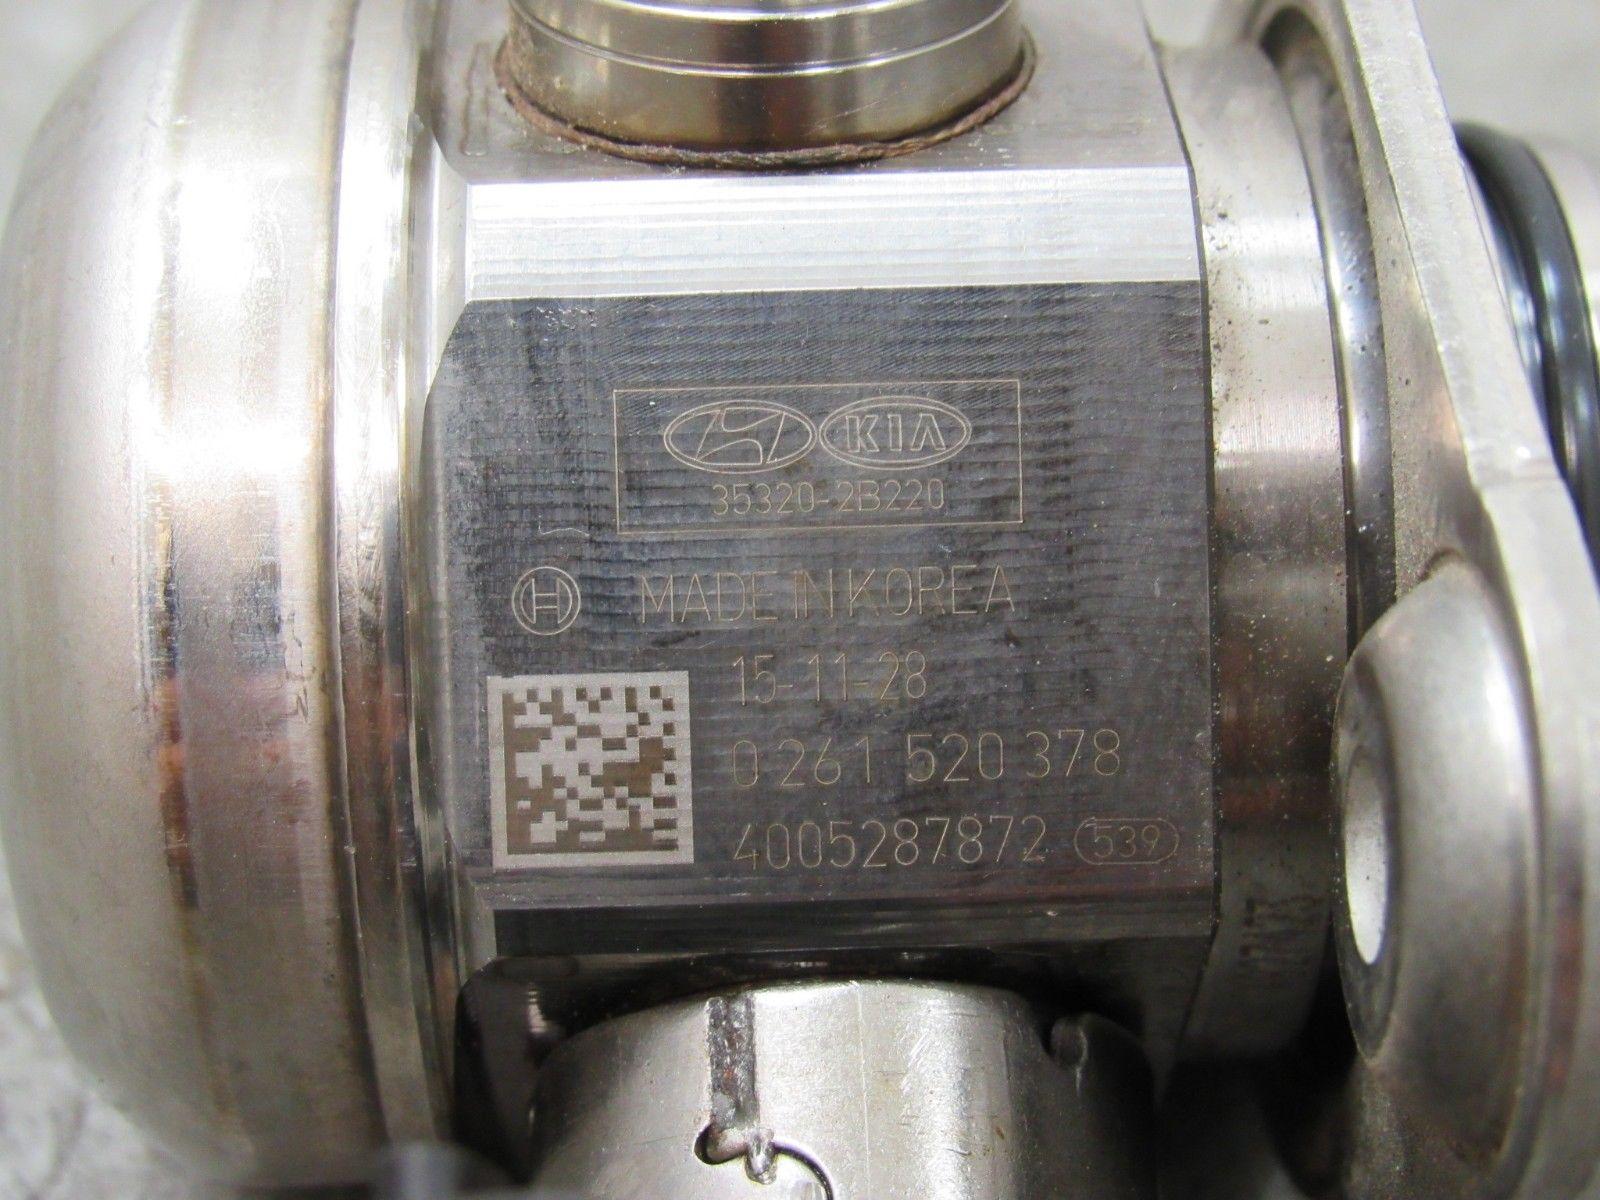 15 17 Sonata Accent Kia Rio 16l Gdi High Pressure Fuel Pump Oem 1 6l Engine 35320 2b220 M